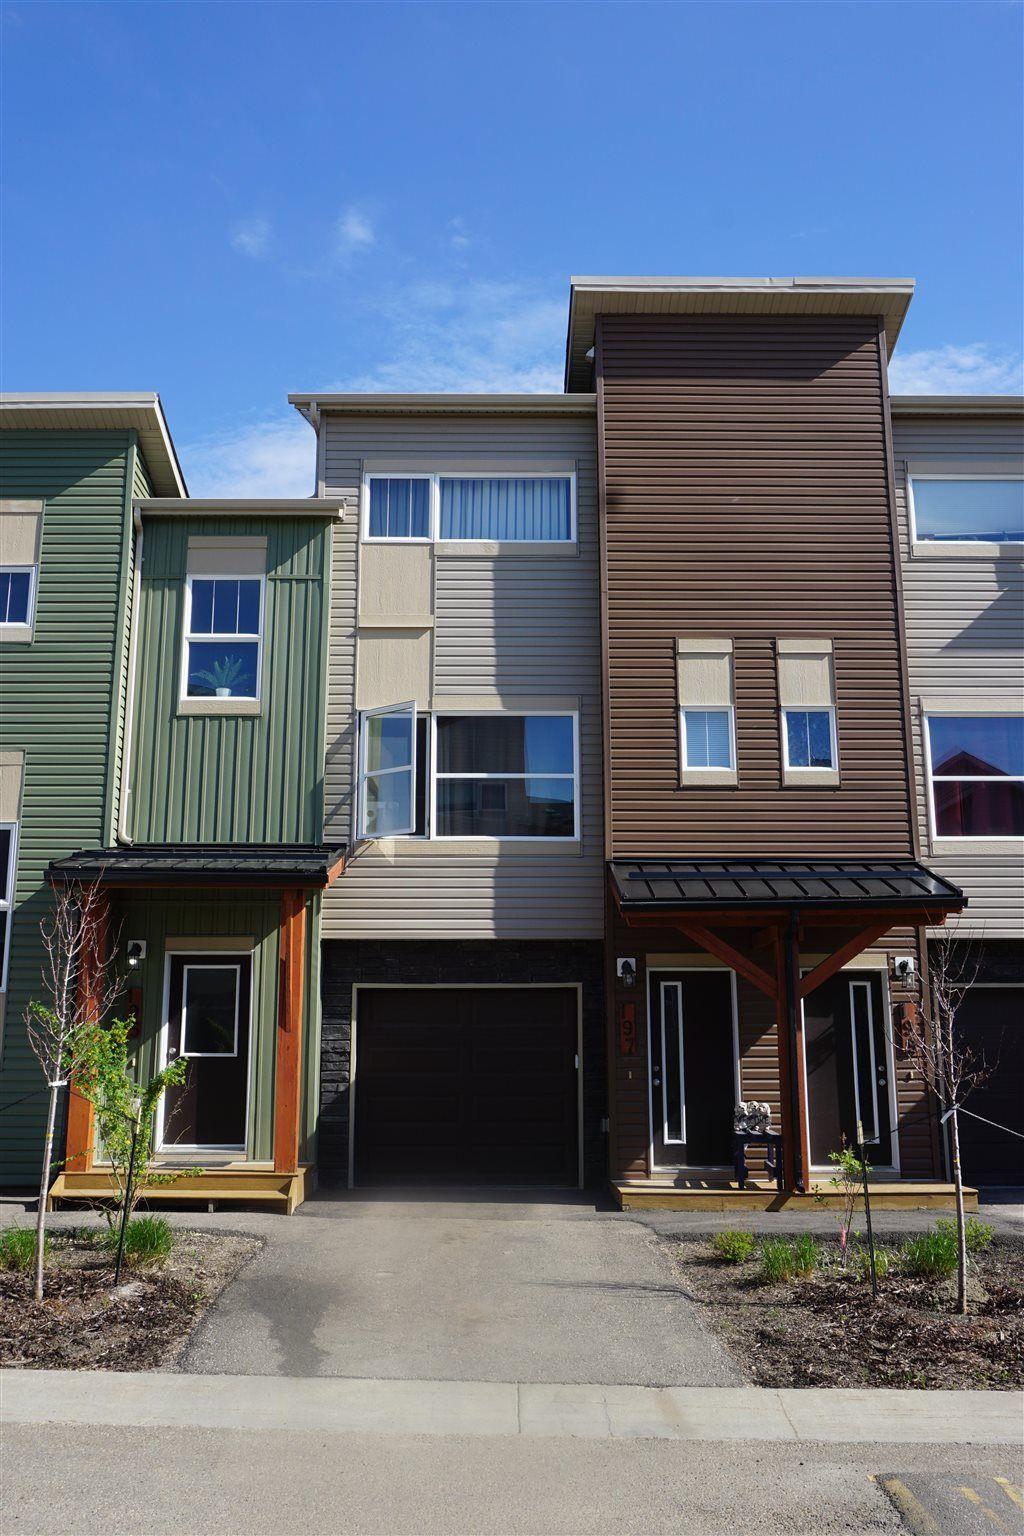 Main Photo: 197 401 SOUTHFORK Drive: Leduc Townhouse for sale : MLS®# E4249158